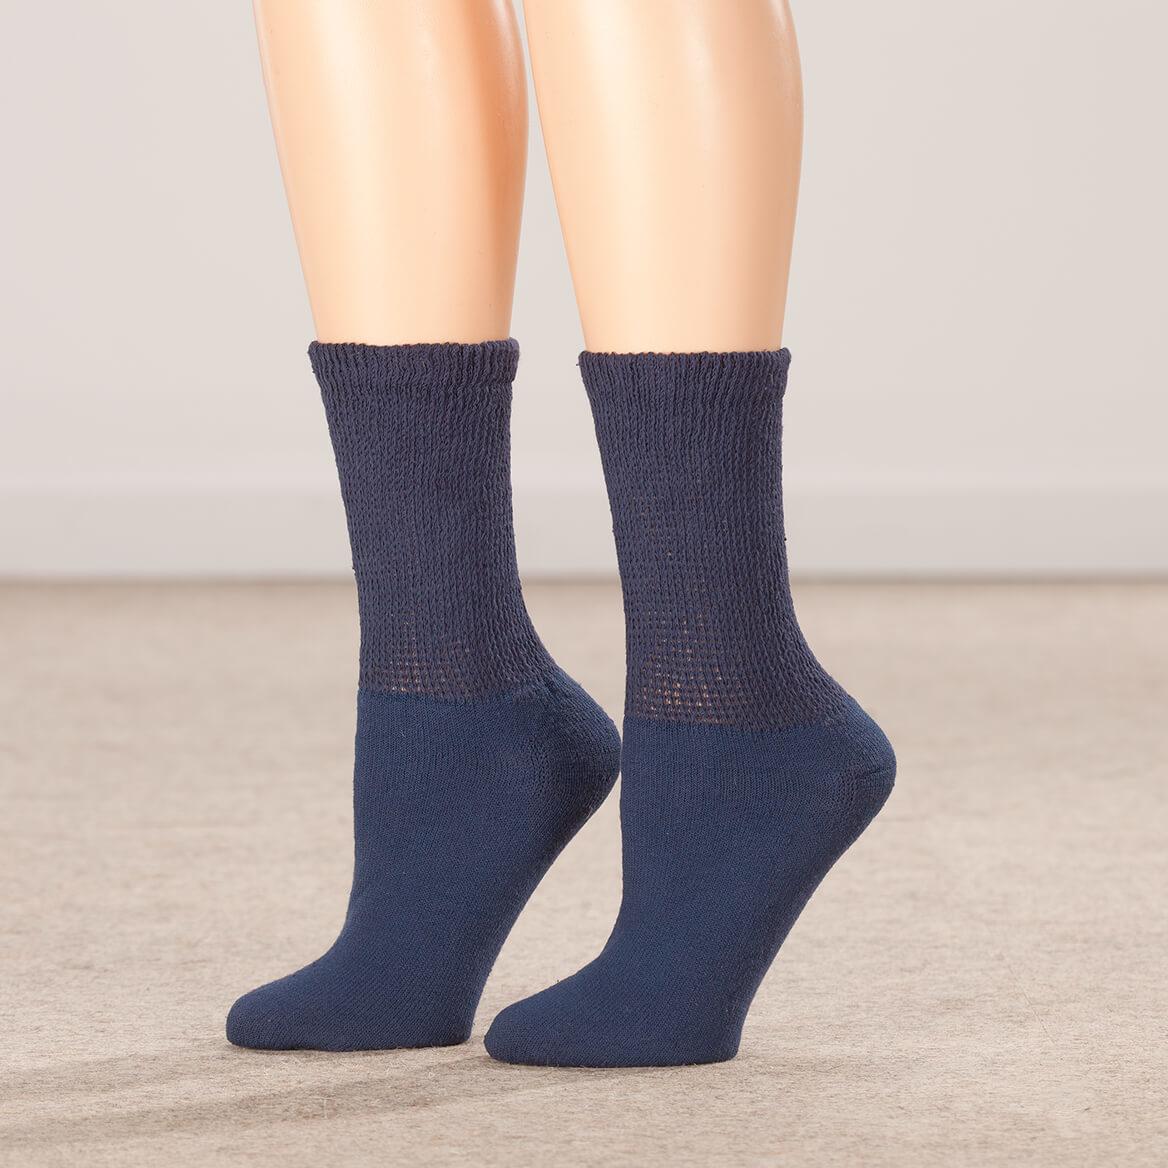 medical socks